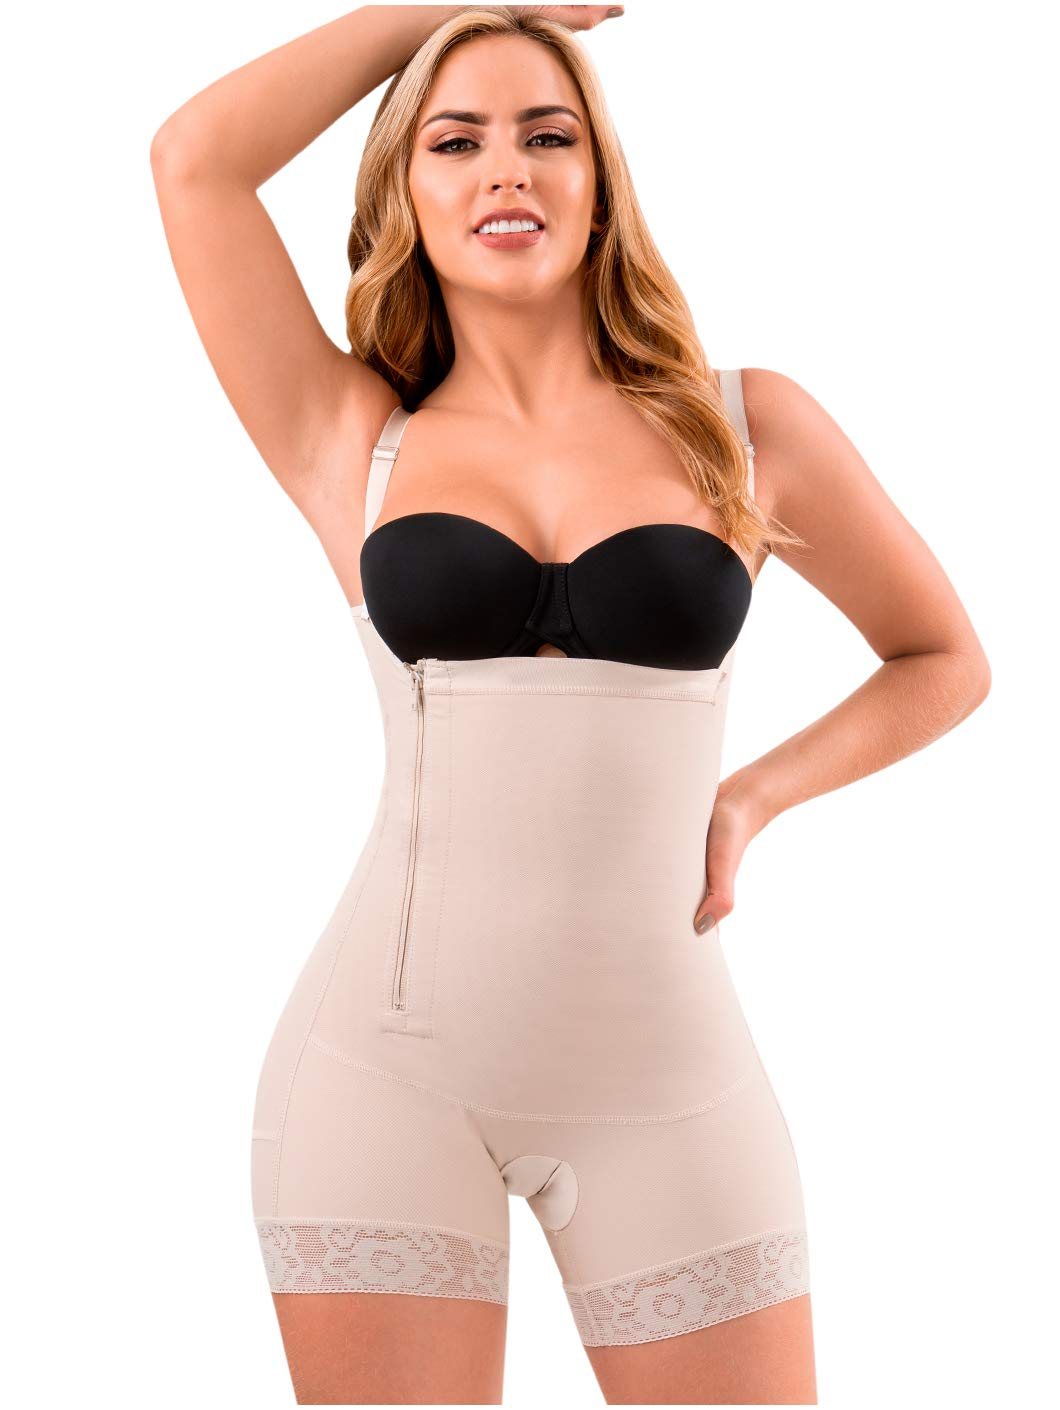 LT.ROSE BBL Faja Garment After Surgery S111 Post Liposuction Compression Garments Tummy Tuck Fajas Colombianas